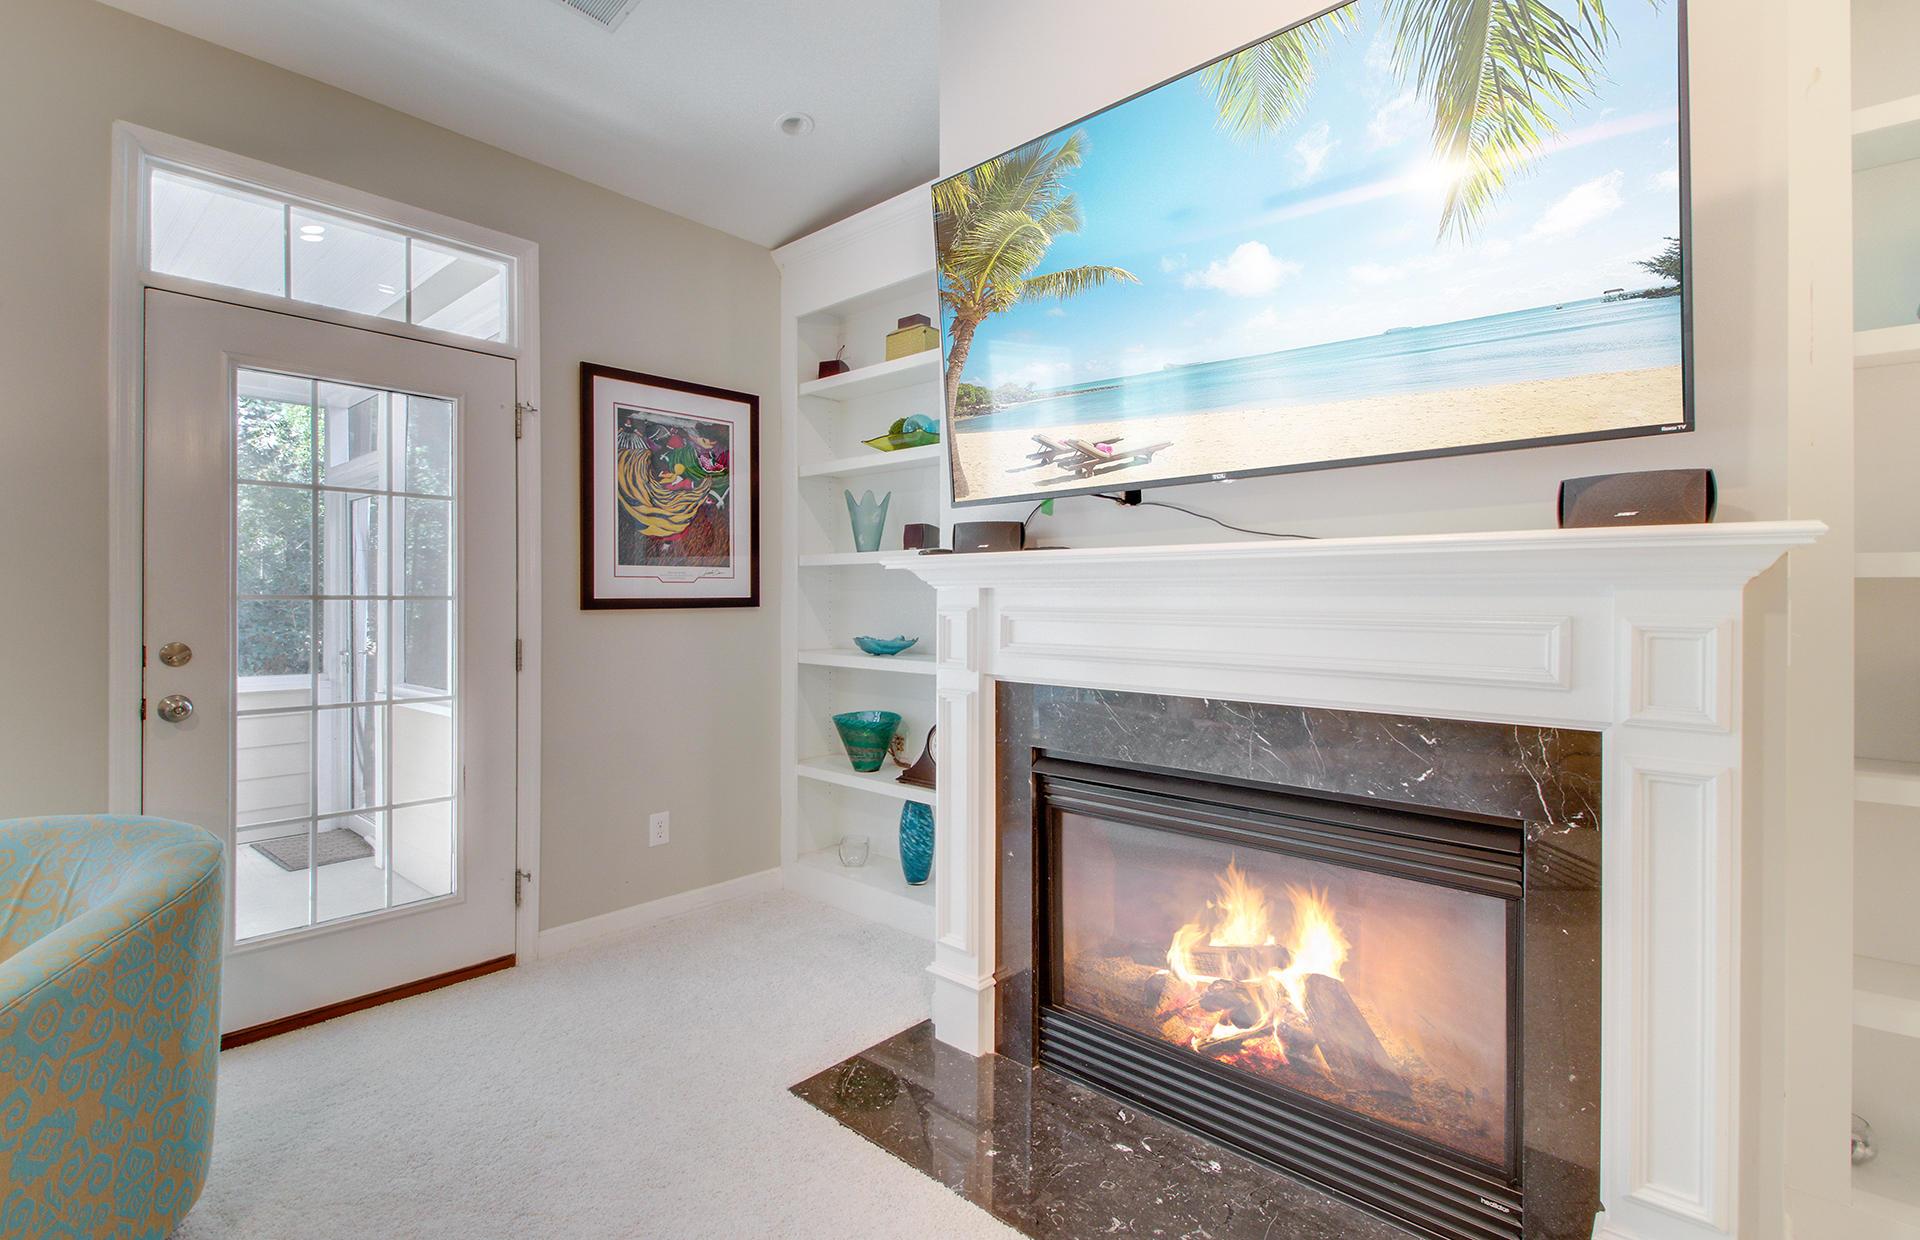 Dunes West Homes For Sale - 145 Fresh Meadow, Mount Pleasant, SC - 18